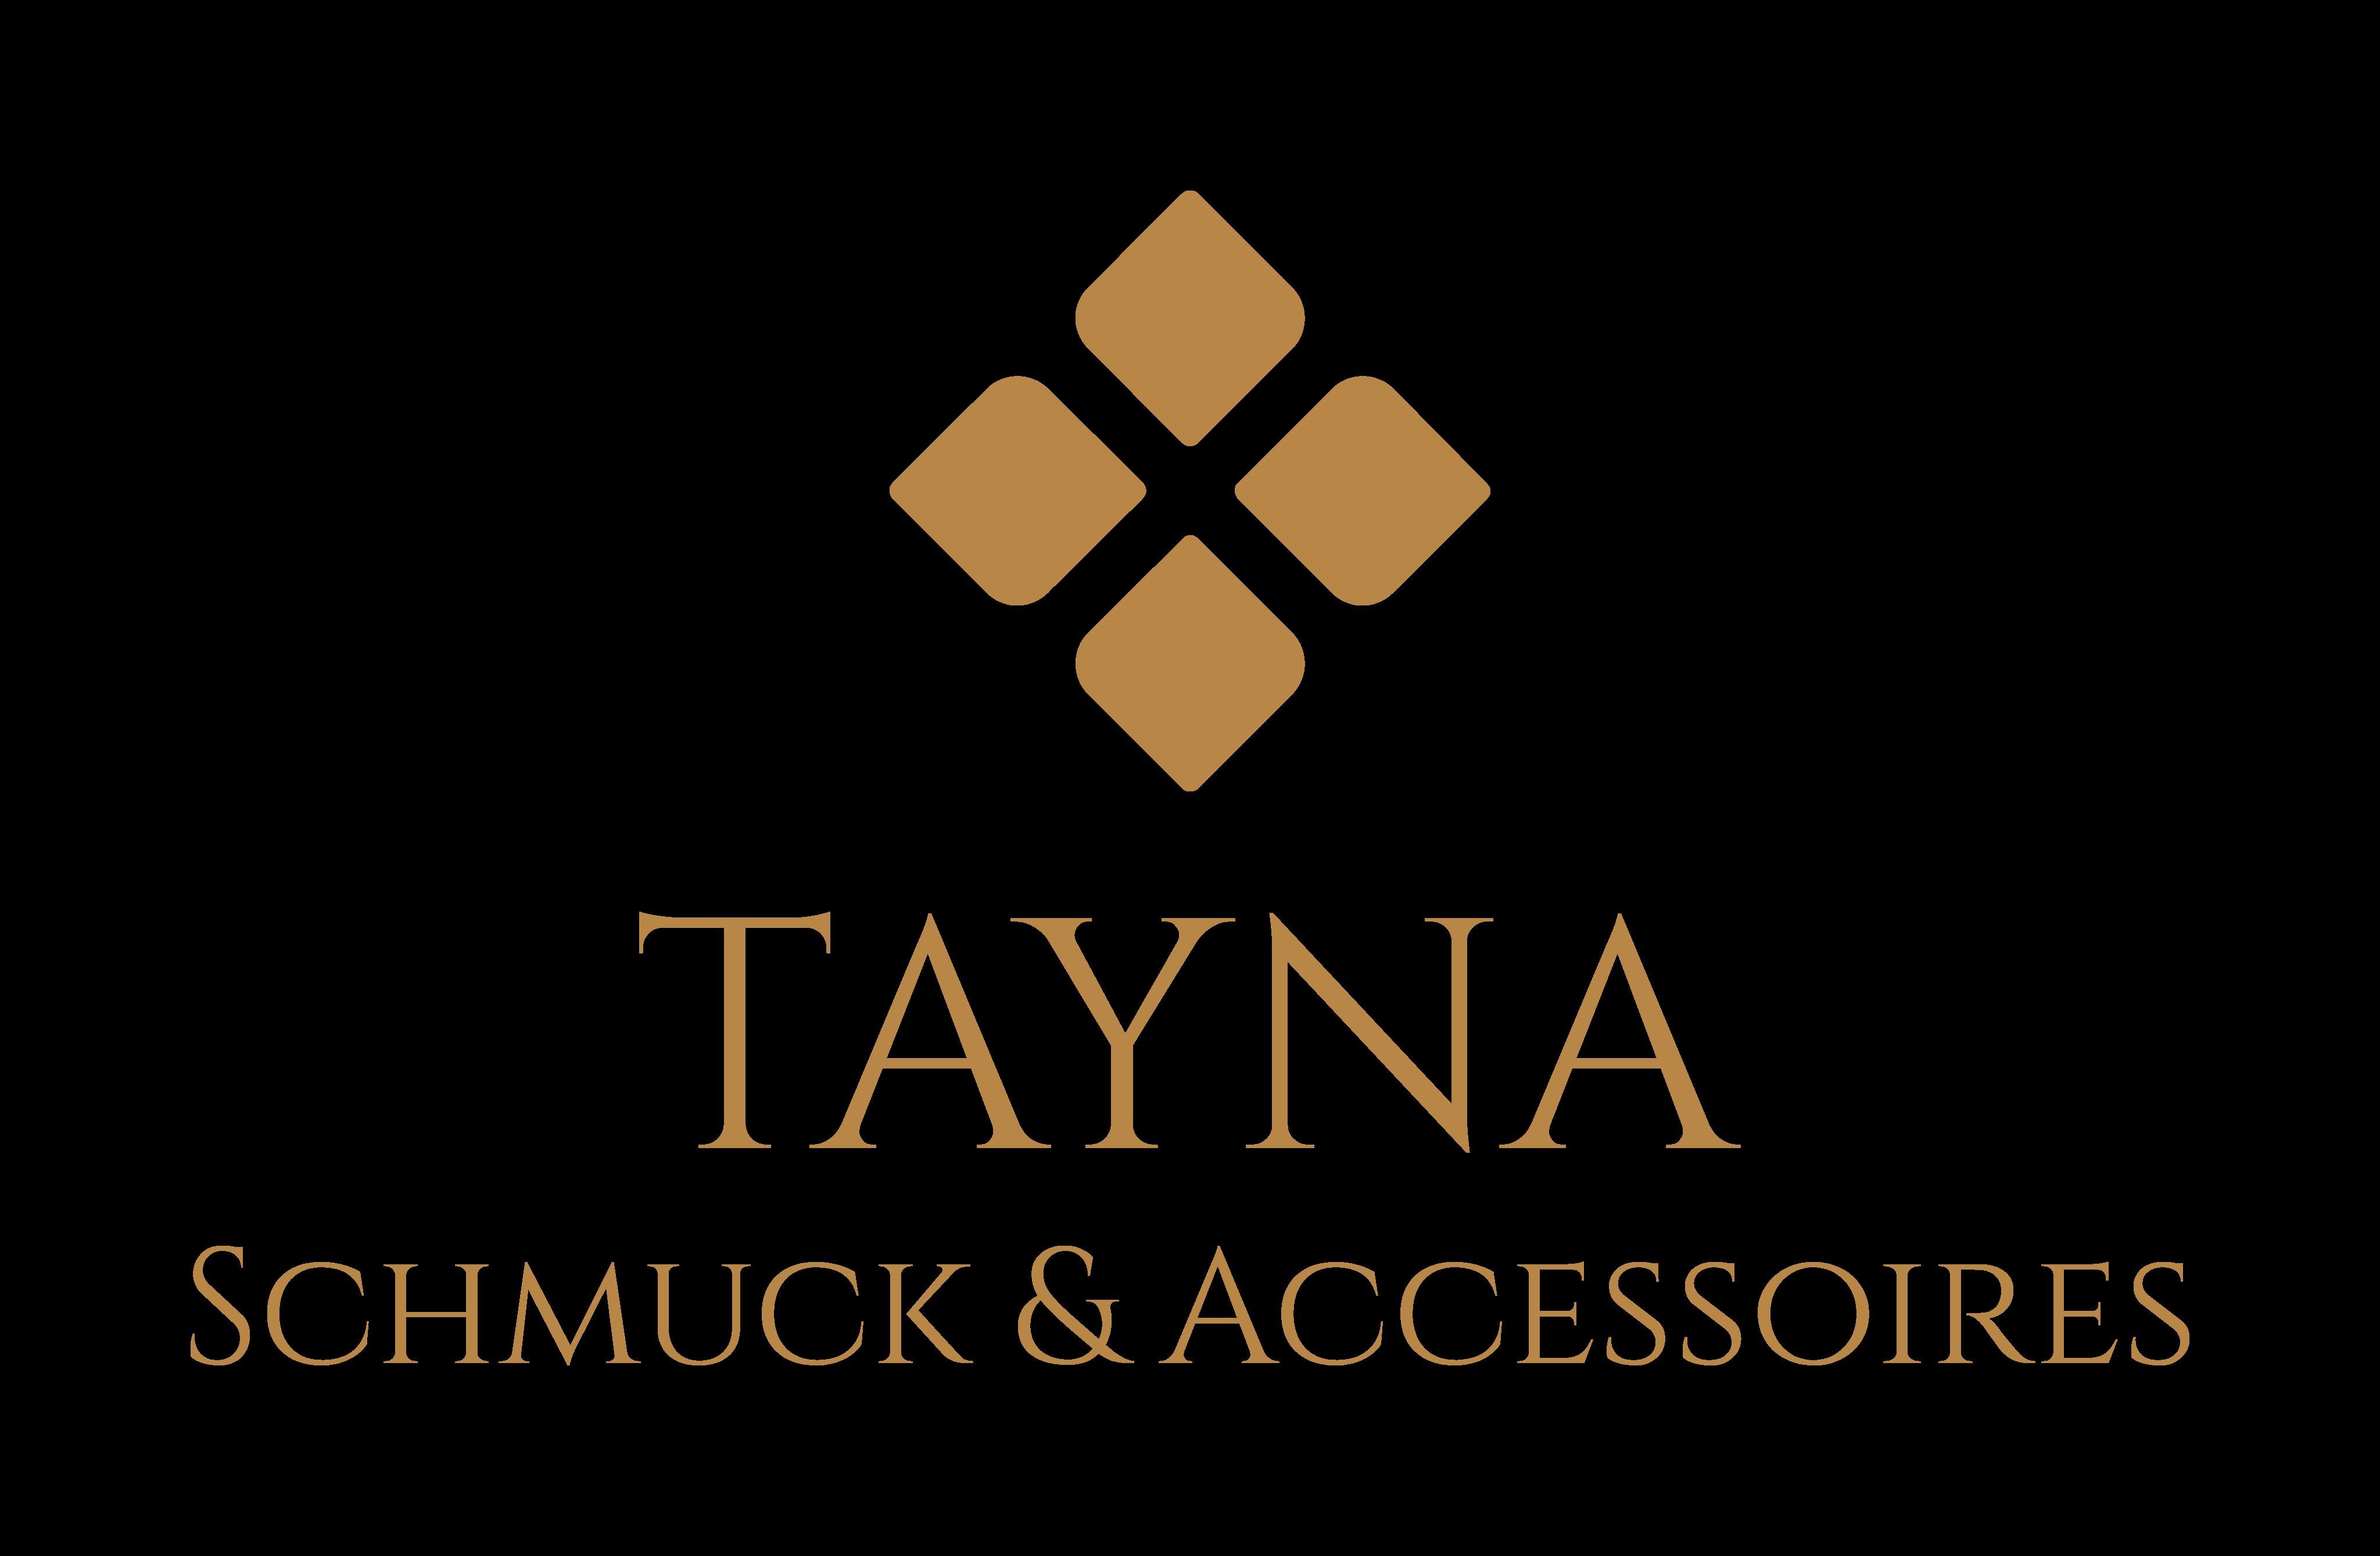 Tayna Schmuck & Accessoires